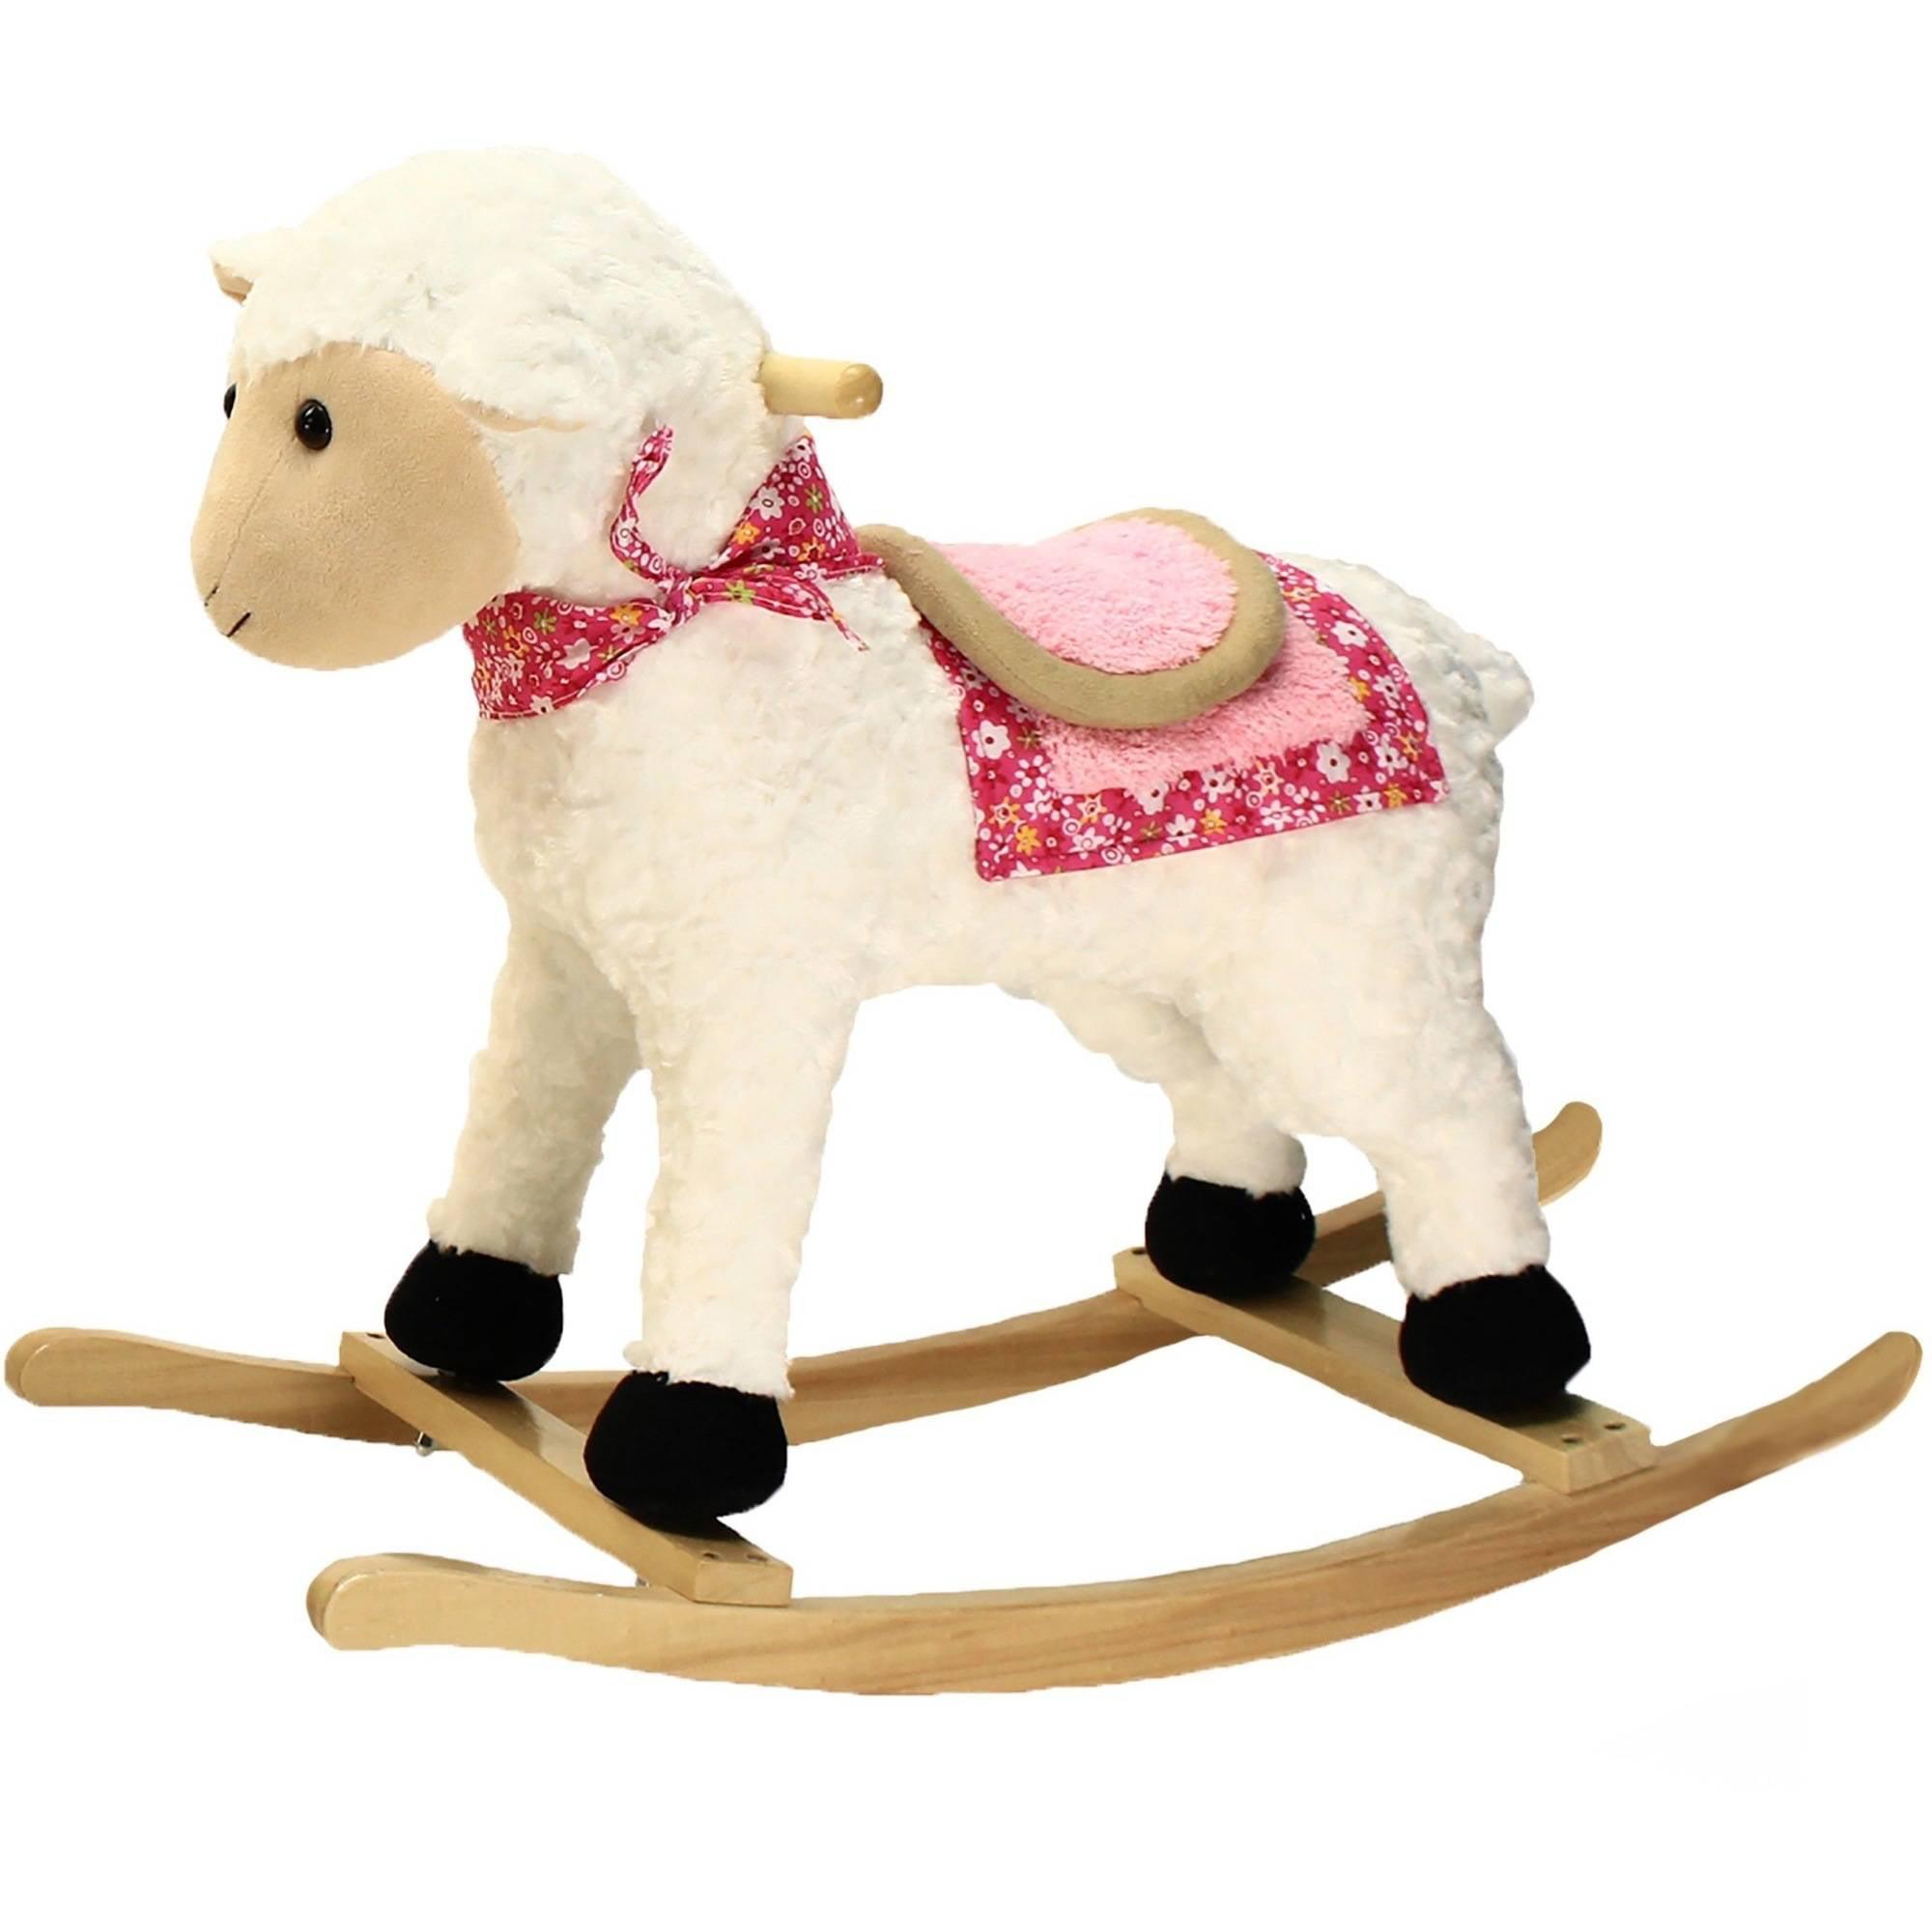 Animal Adventure Farm Rocker, Lamb by